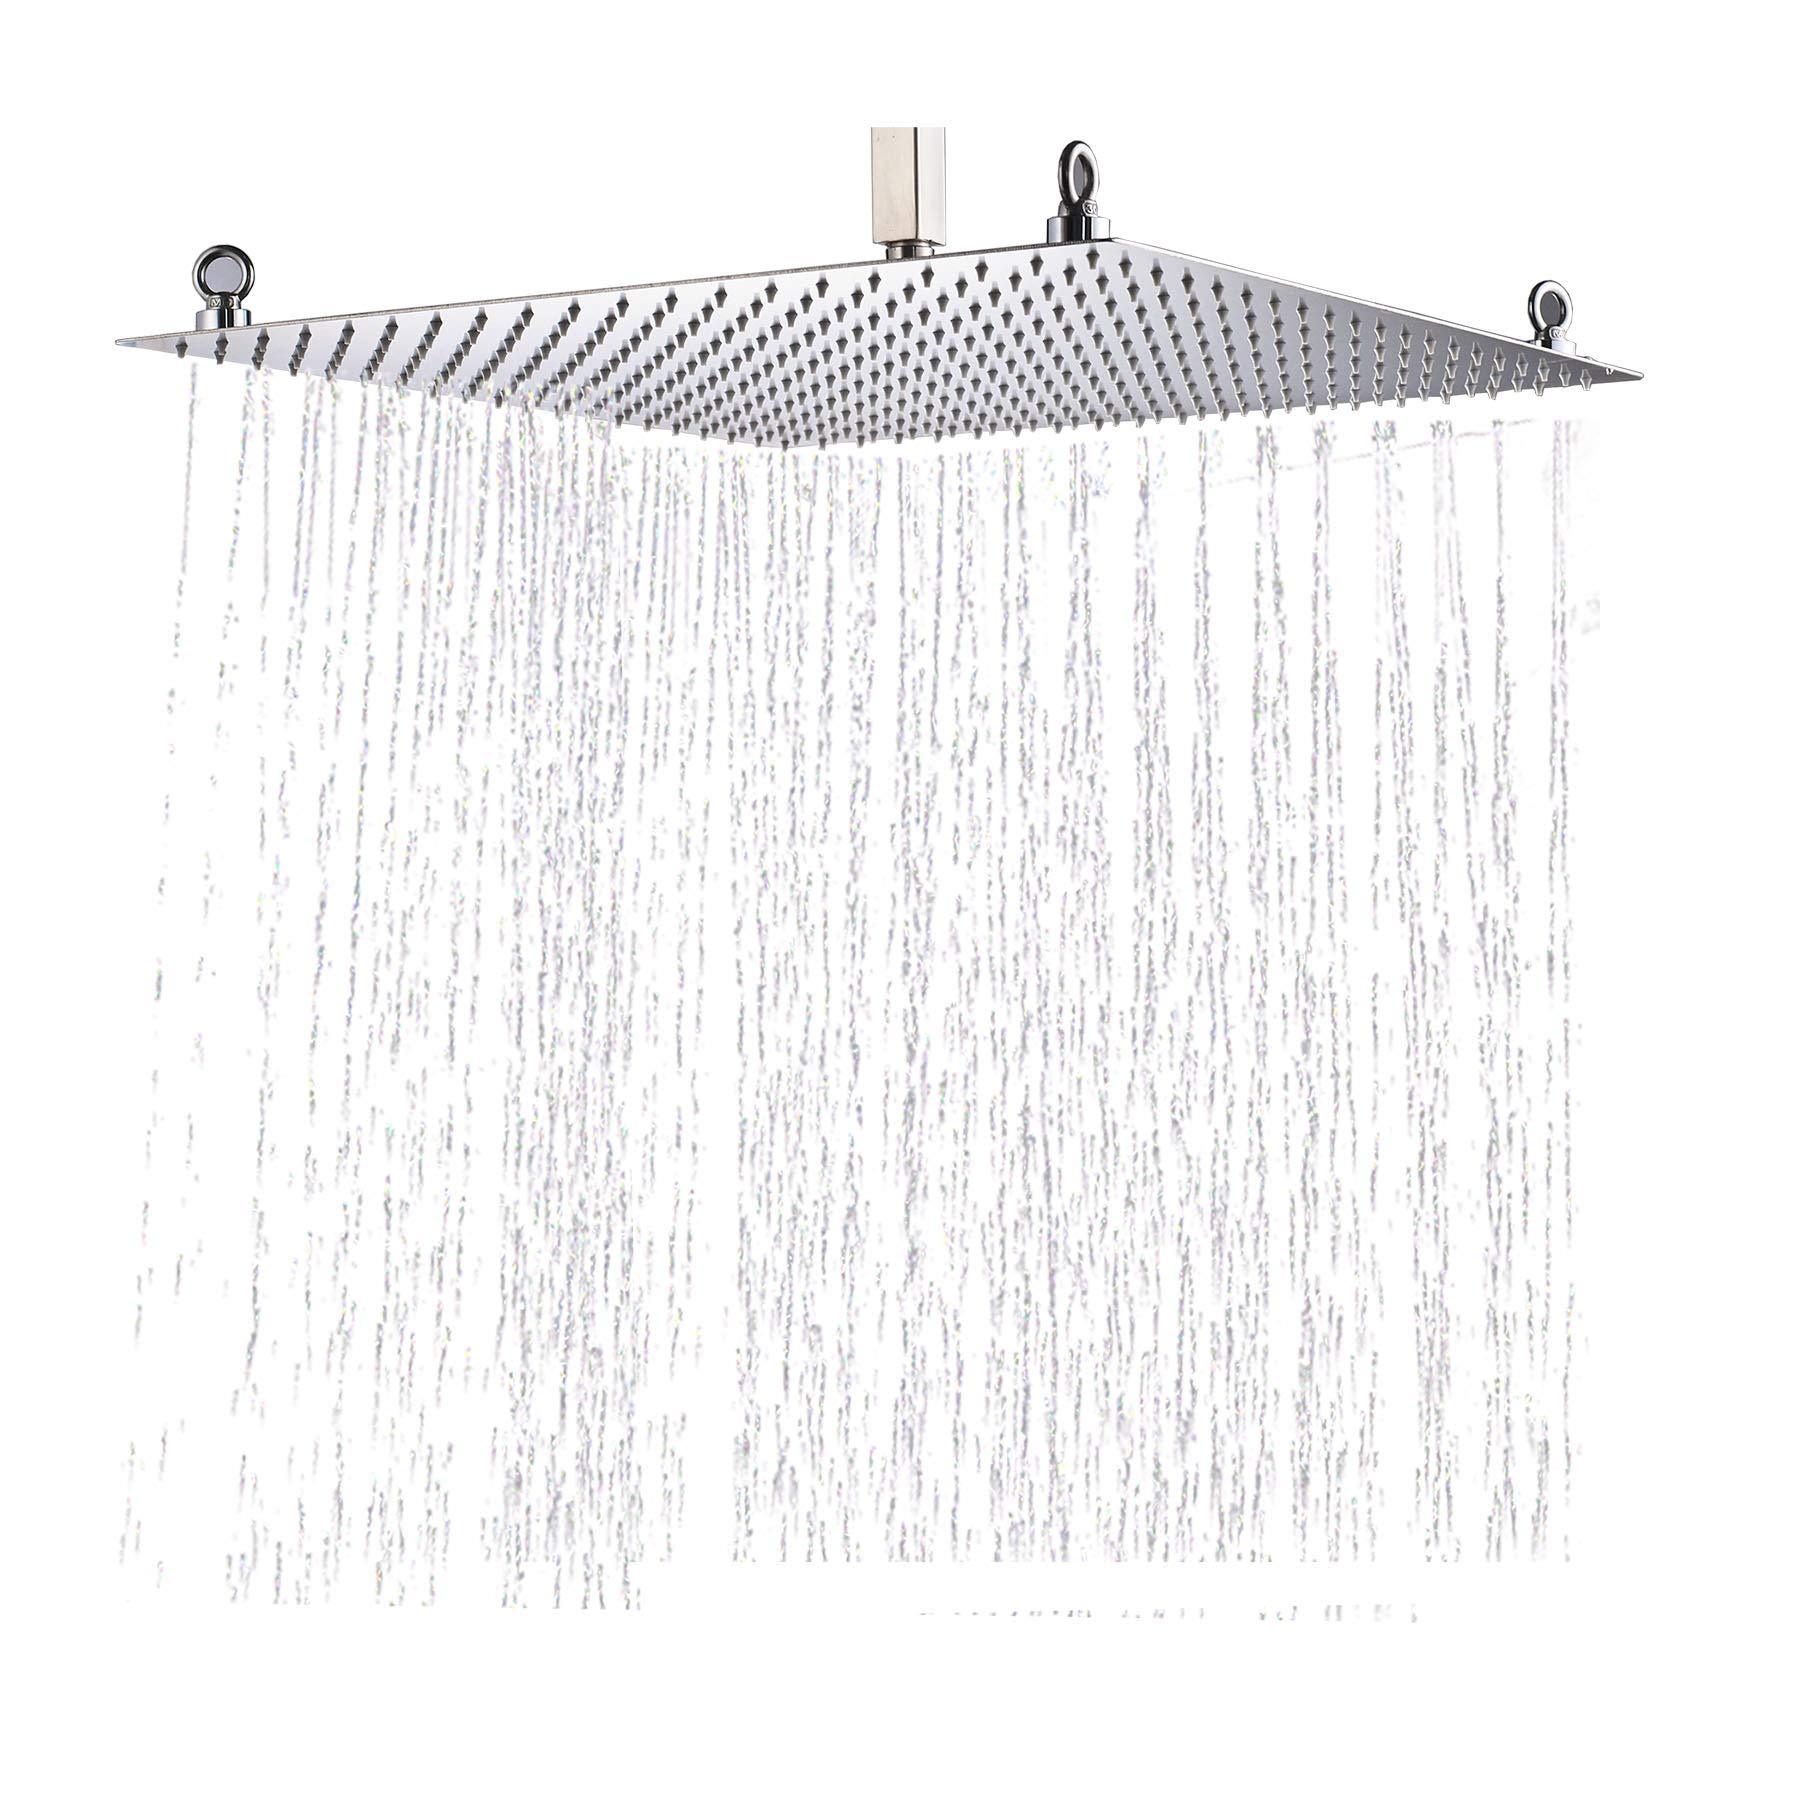 "Bathroom Shower Head 20/"" Square Ultra Thin 304 Stainless Steel Rainfall Chrome"